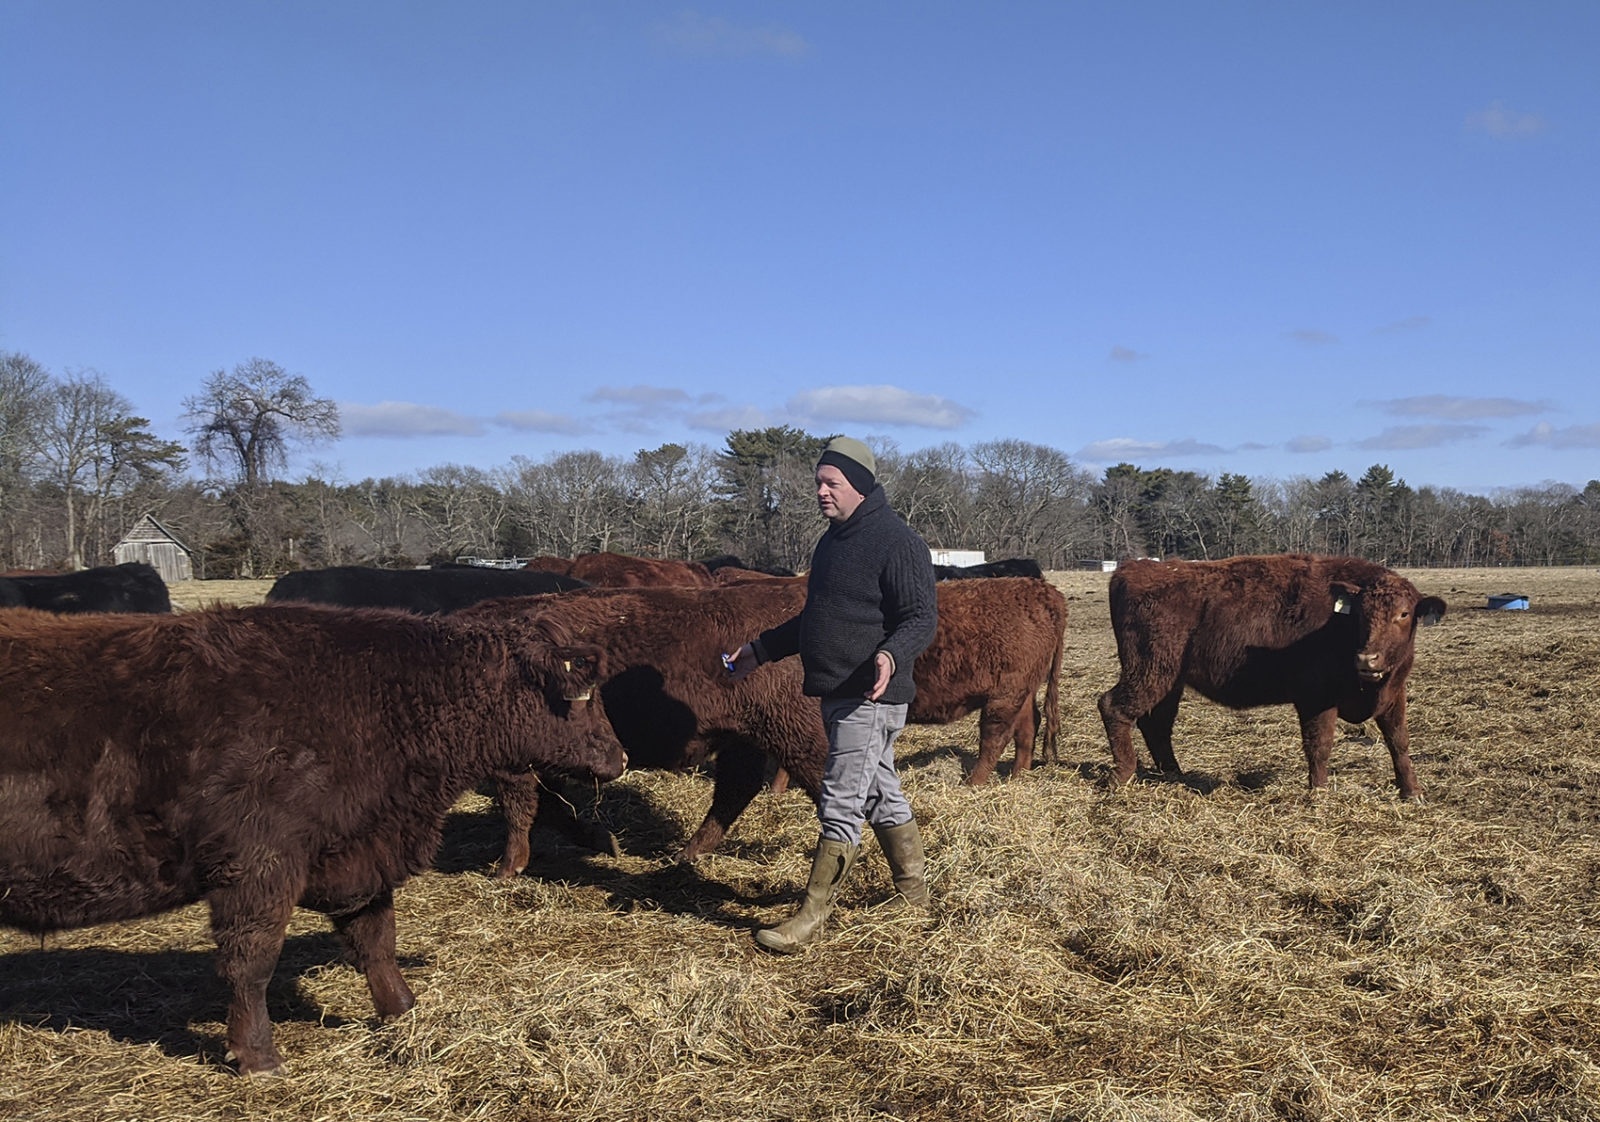 Acabonac Farms owner Stephen Skrenta with his cattle in Yaphank.